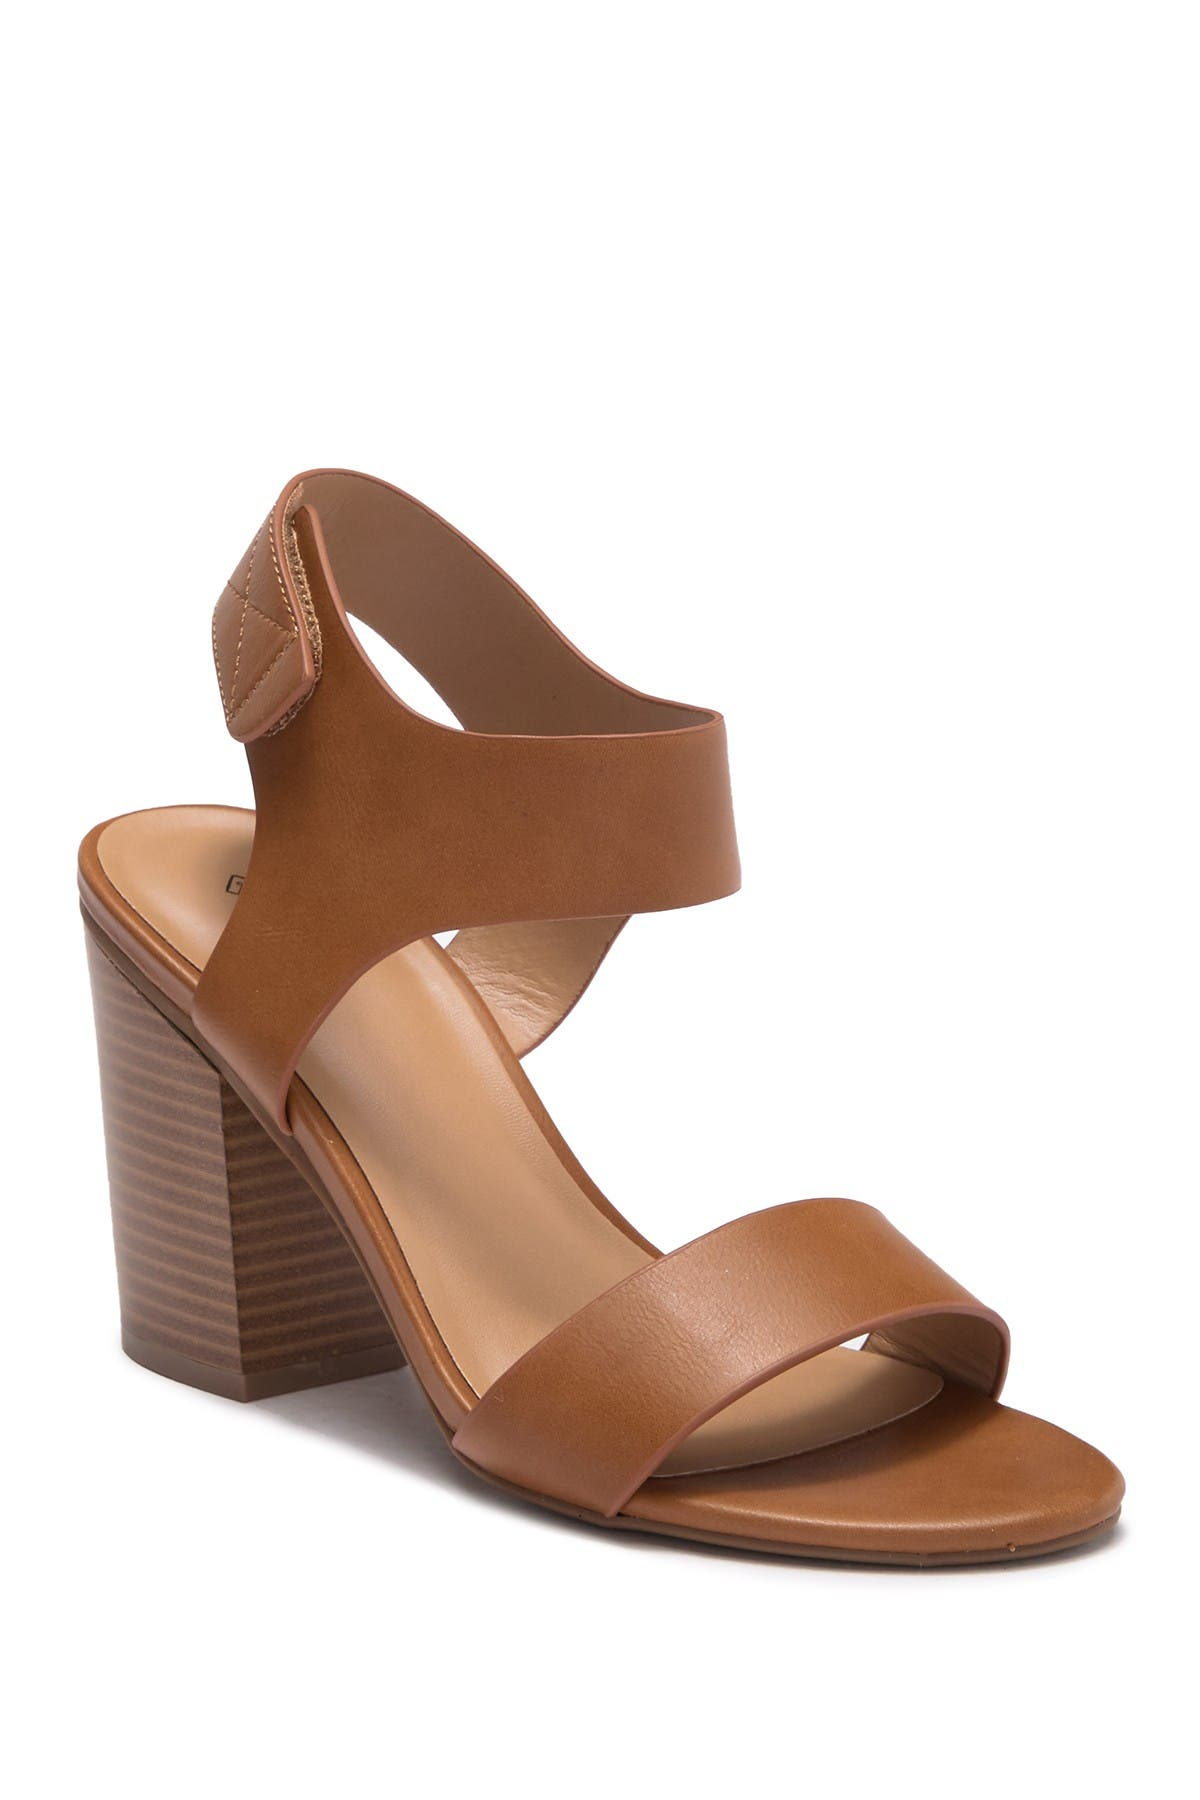 Image of Call It Spring Tralia Block Heel Sandal